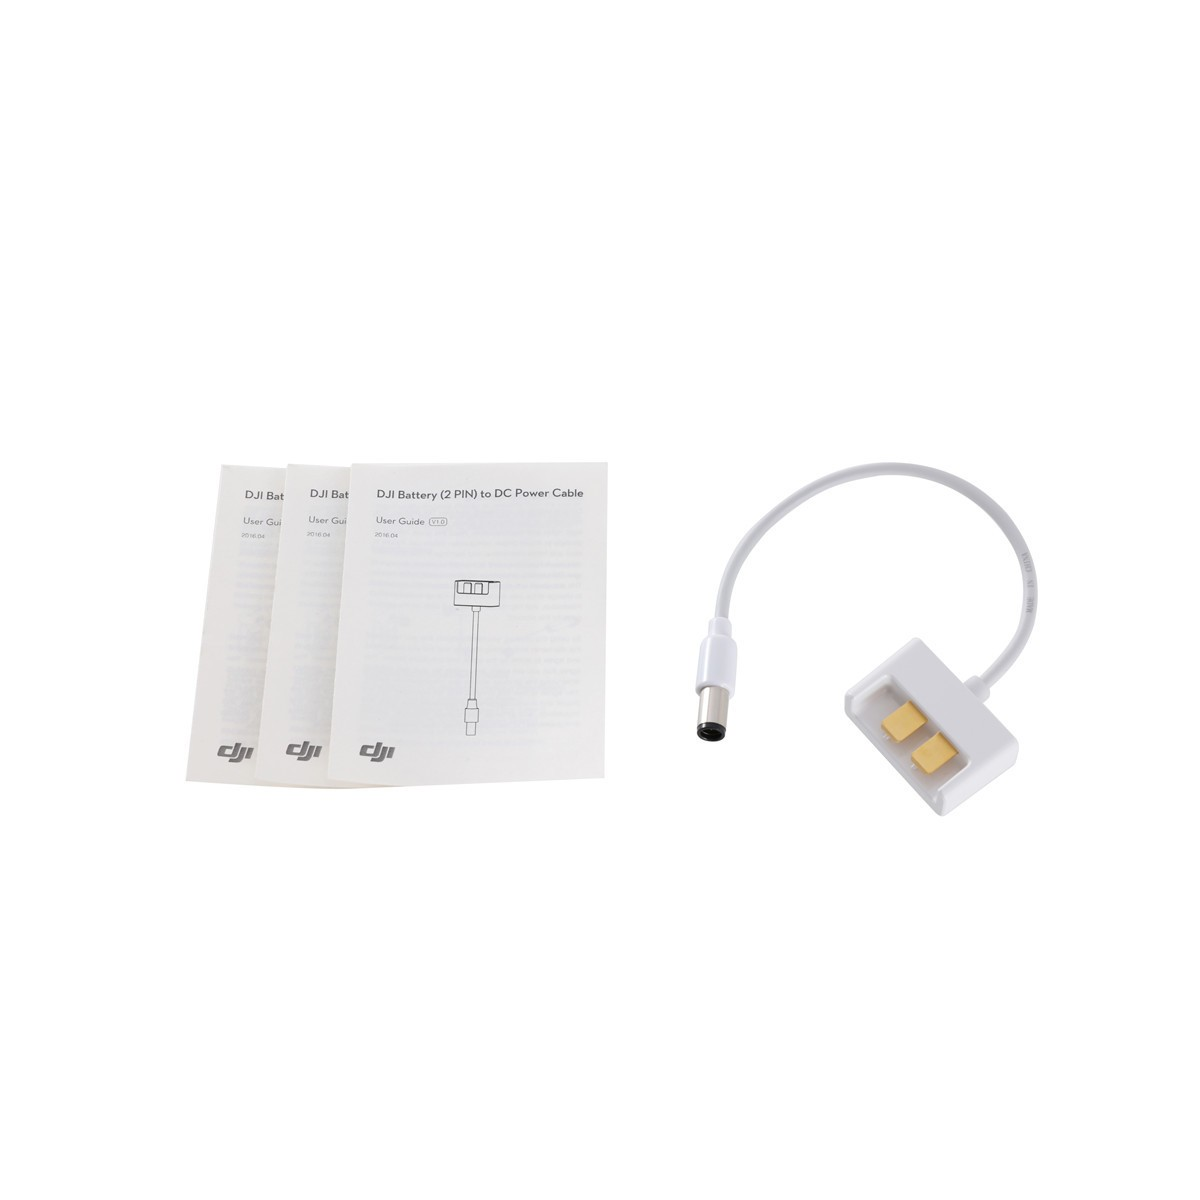 DJI™ Phantom 3 Accessories, Parts & Upgrades - DroneNerds com